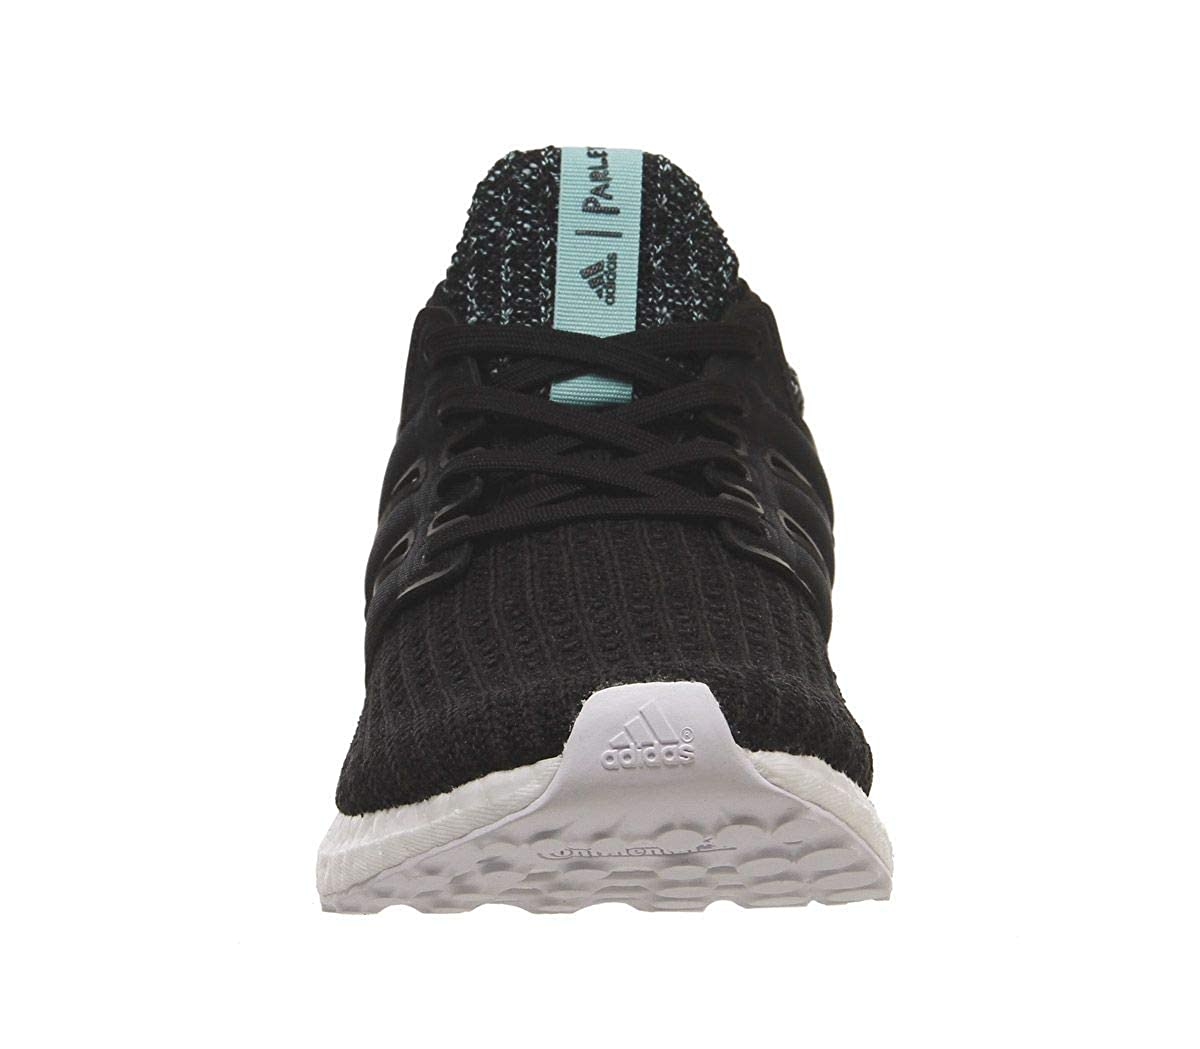 46e99e244e141 adidas Ultra Boost